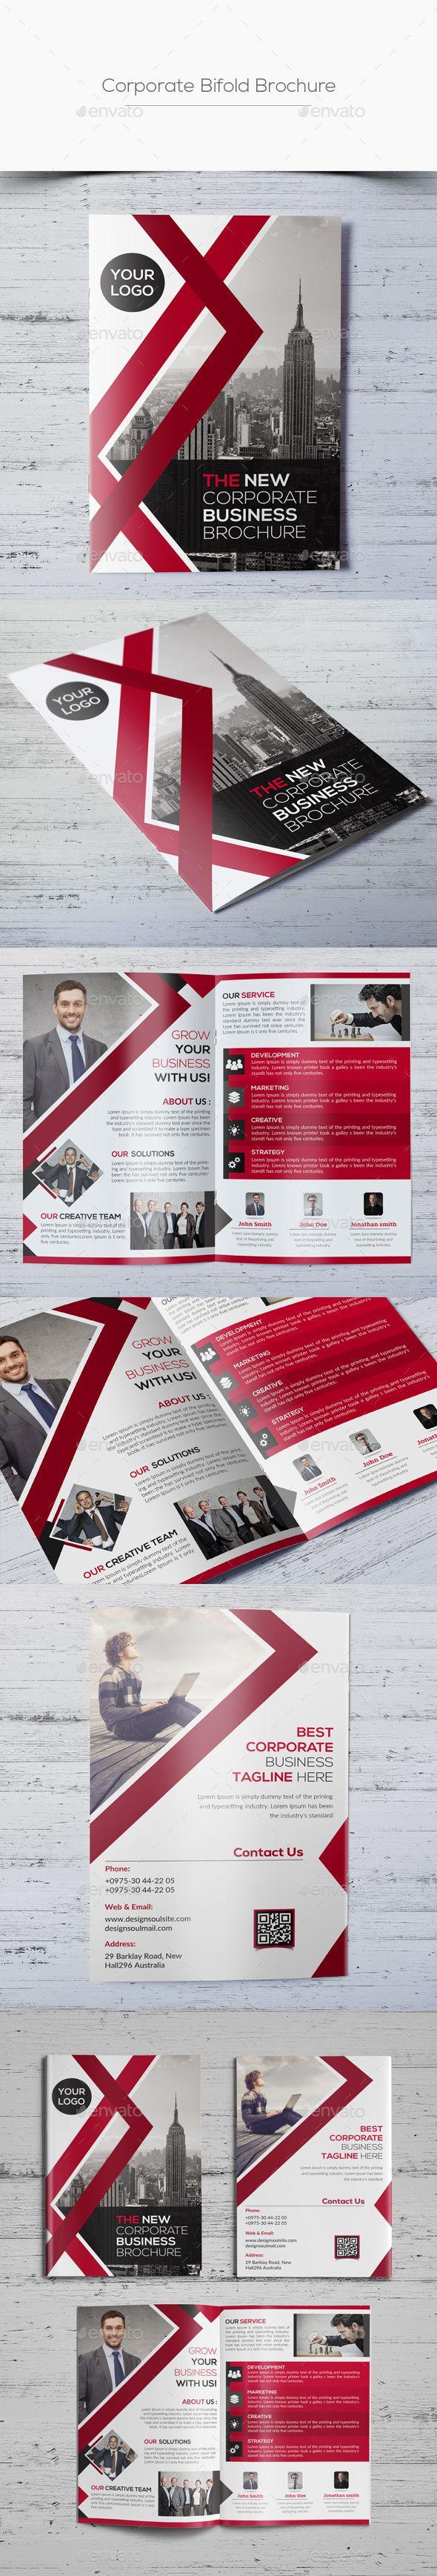 Corporate Bifold Brochure Template PSD #design Download: http://graphicriver.net/item/corporate-bifold-brochure/13480334?ref=ksioks